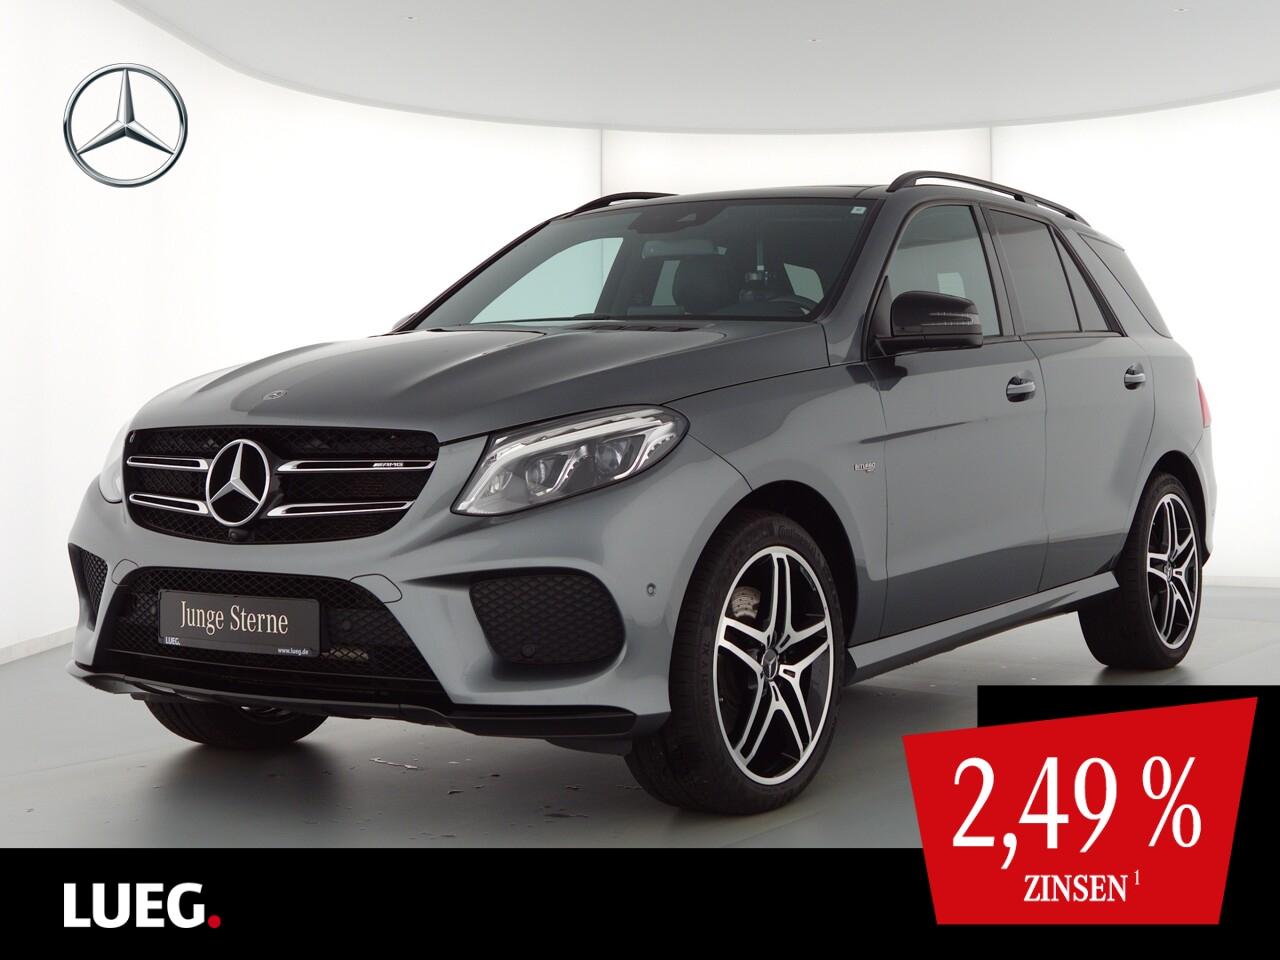 Mercedes-Benz GLE 43 AMG 4M COM+Pano+LED-ILS+21''+H&K+Airm+360, Jahr 2018, Benzin